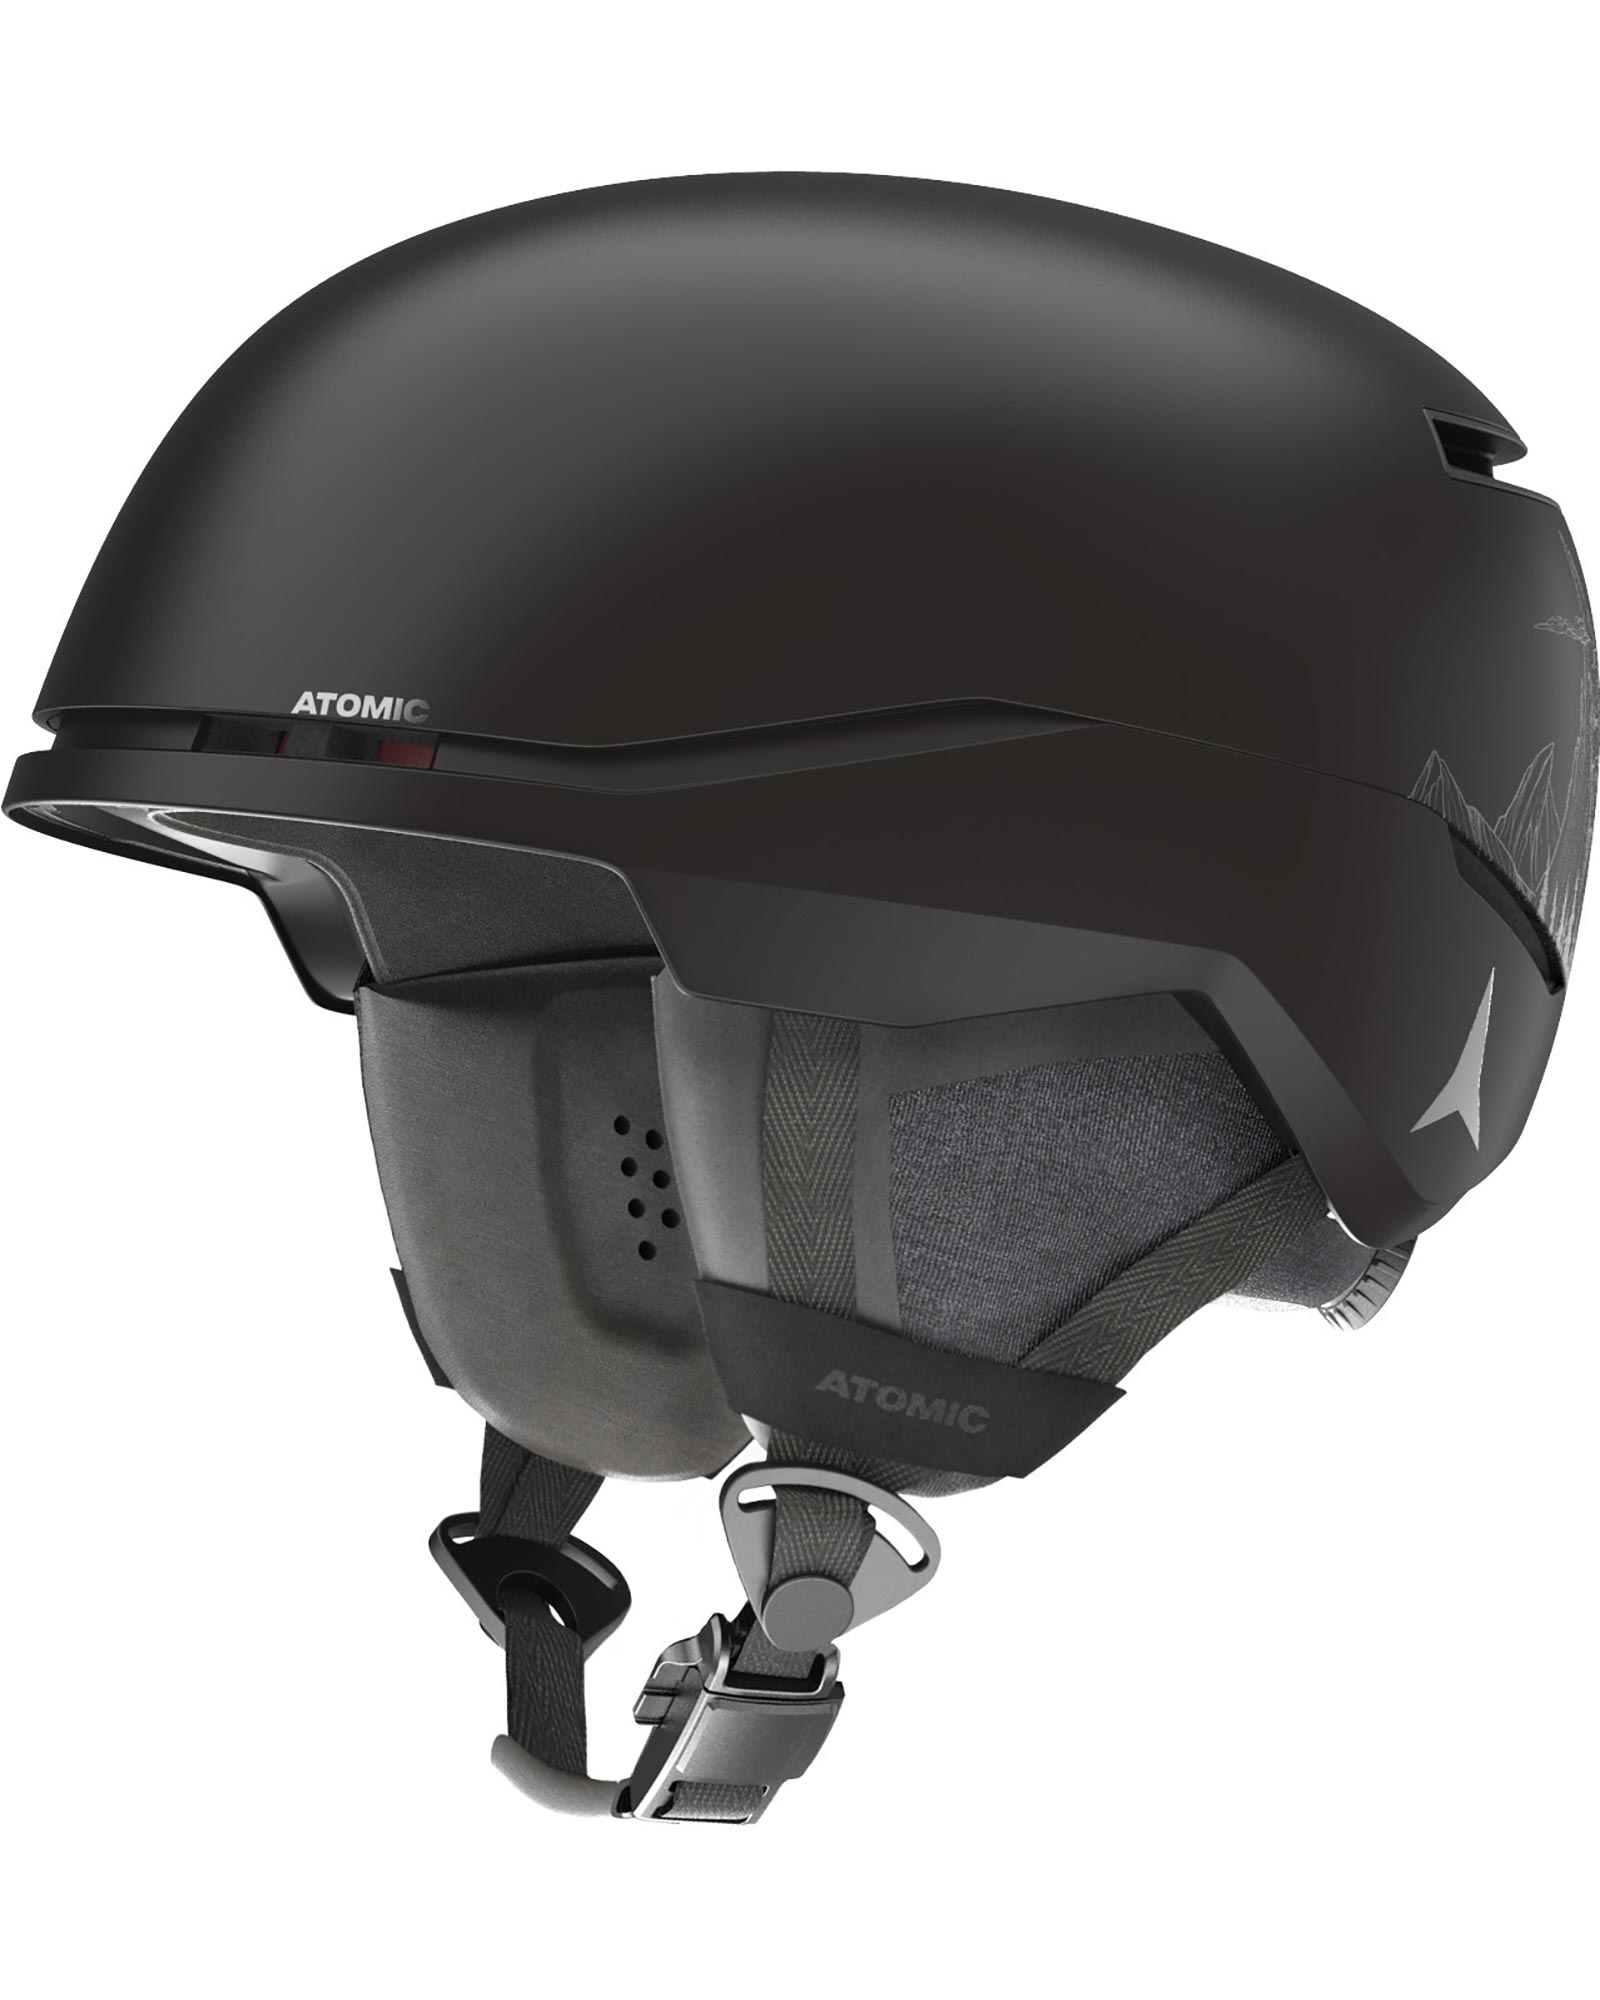 Atomic Four AMID Pro Ski/Snowboard Helmet 2021 0